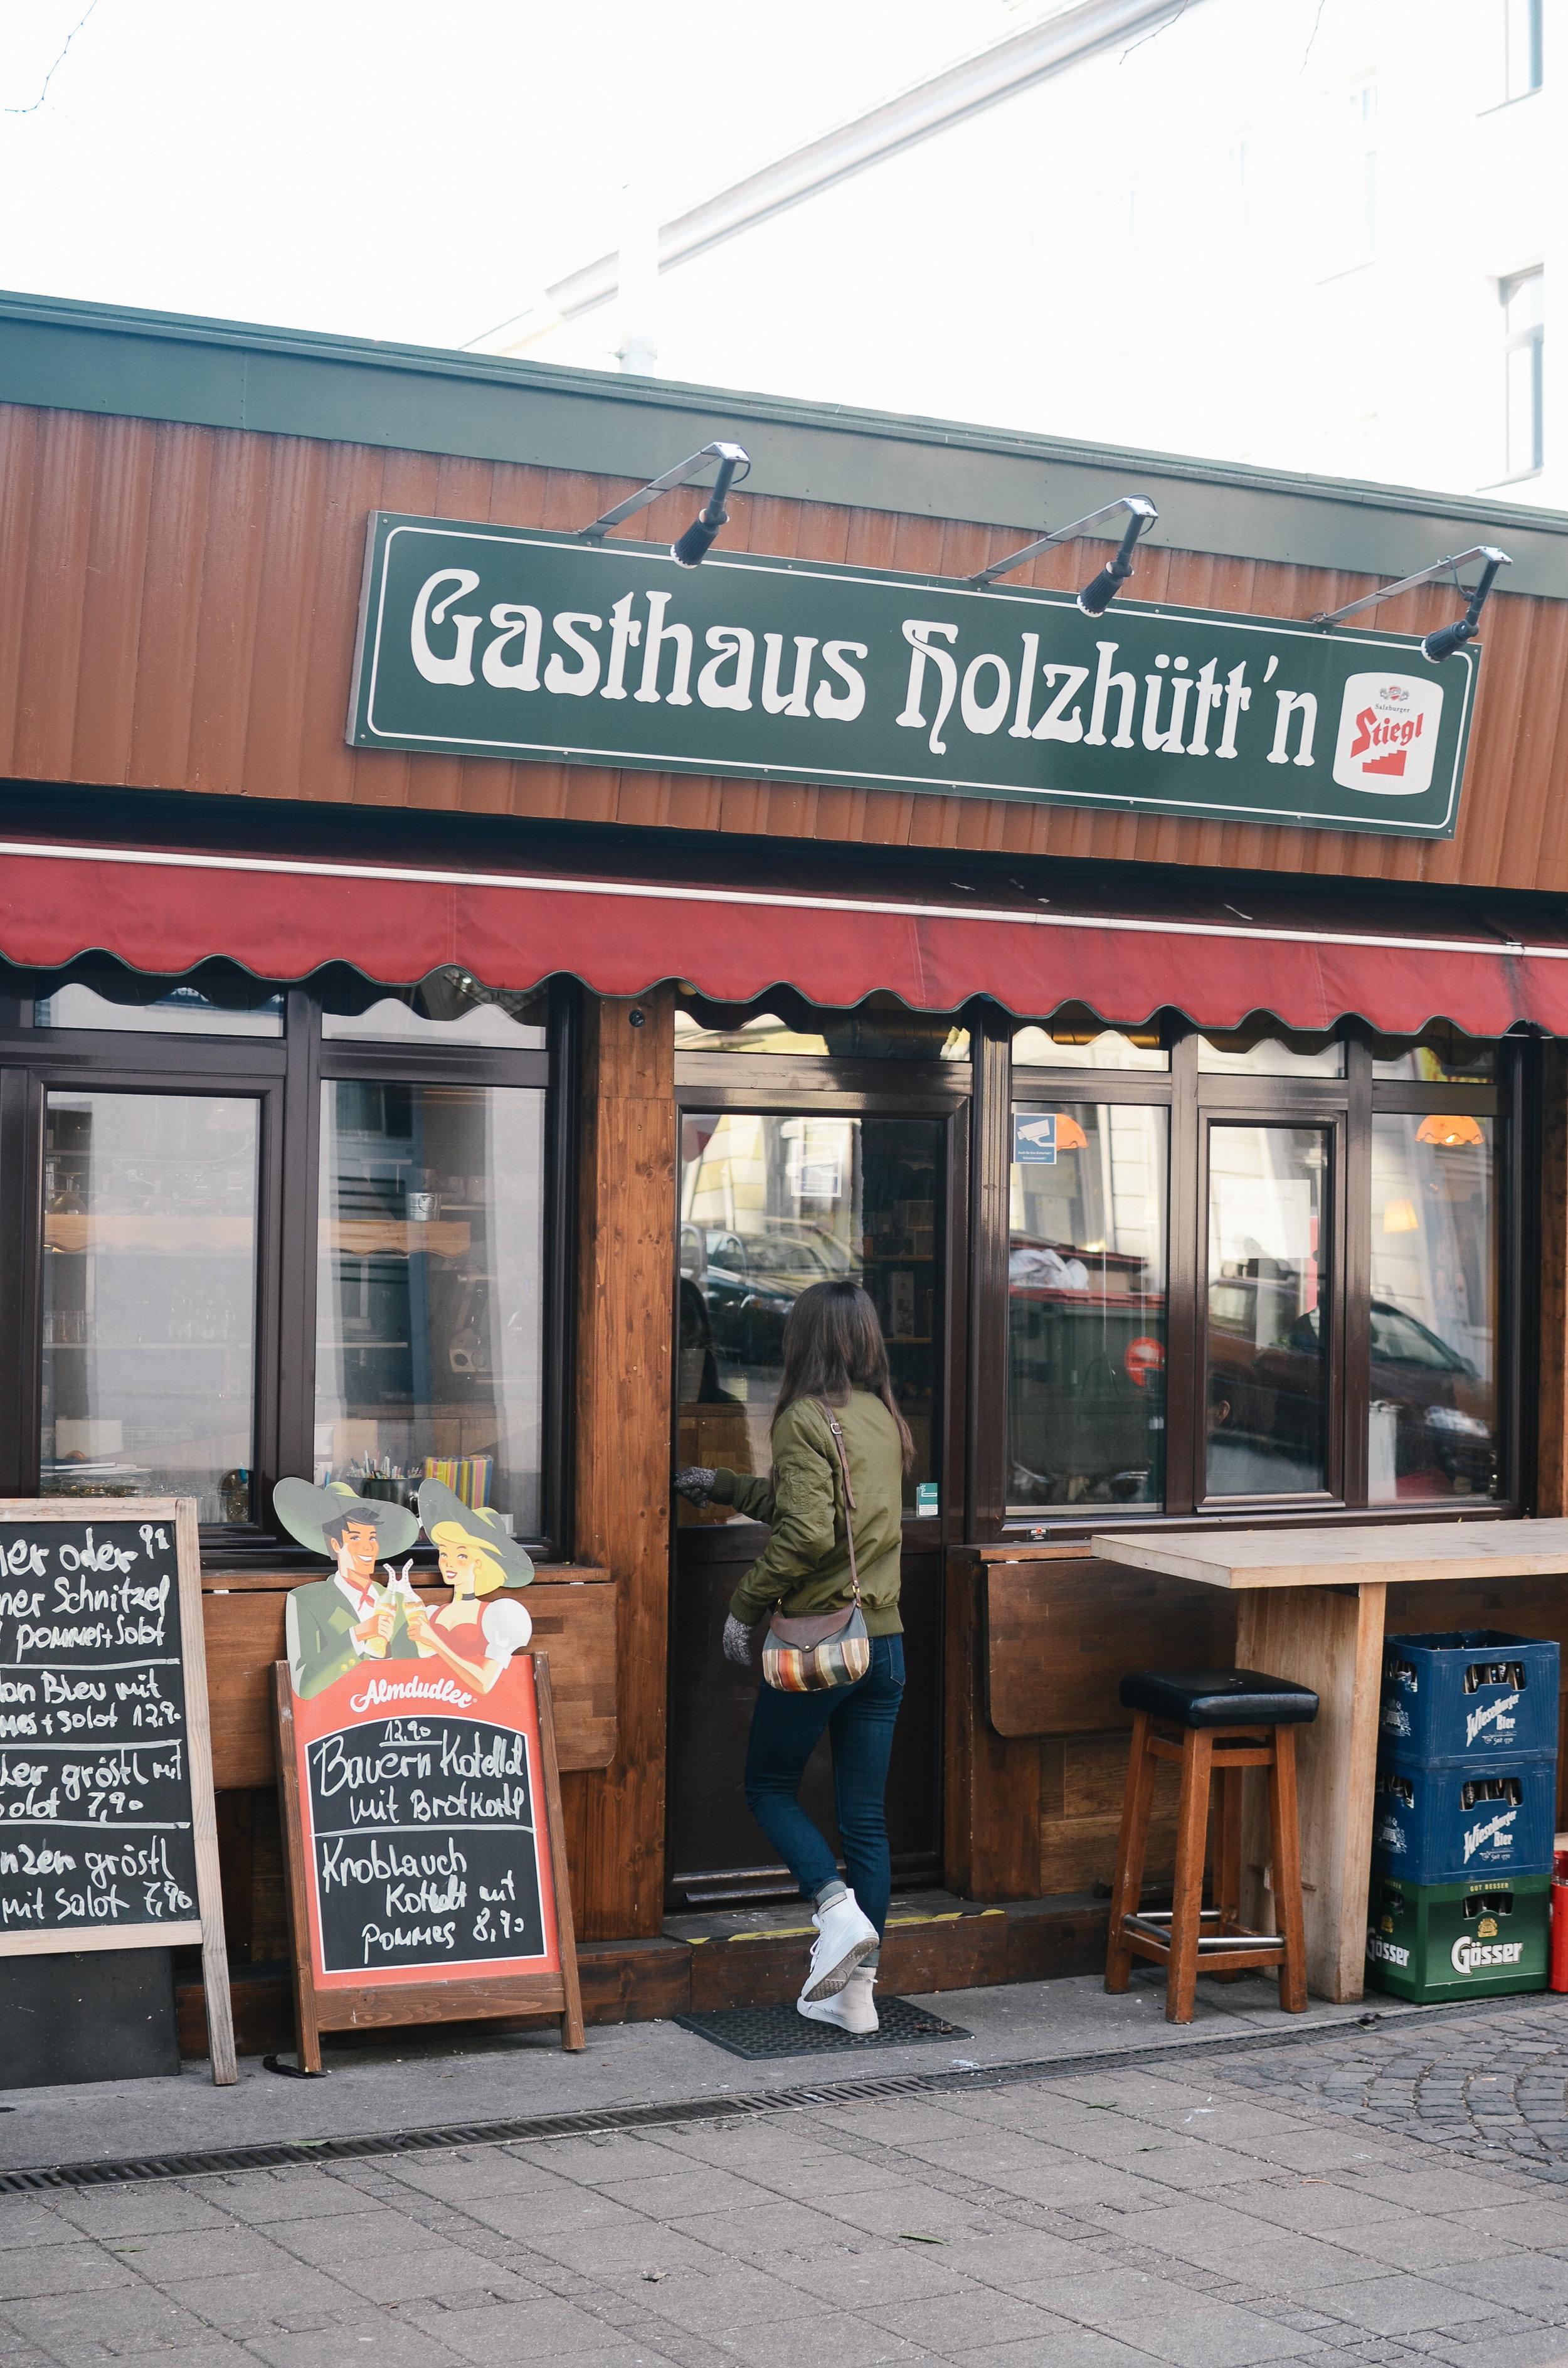 vienna-austria-where-to-stay-travel-guide-lifeonpine_DSC_1368.jpg